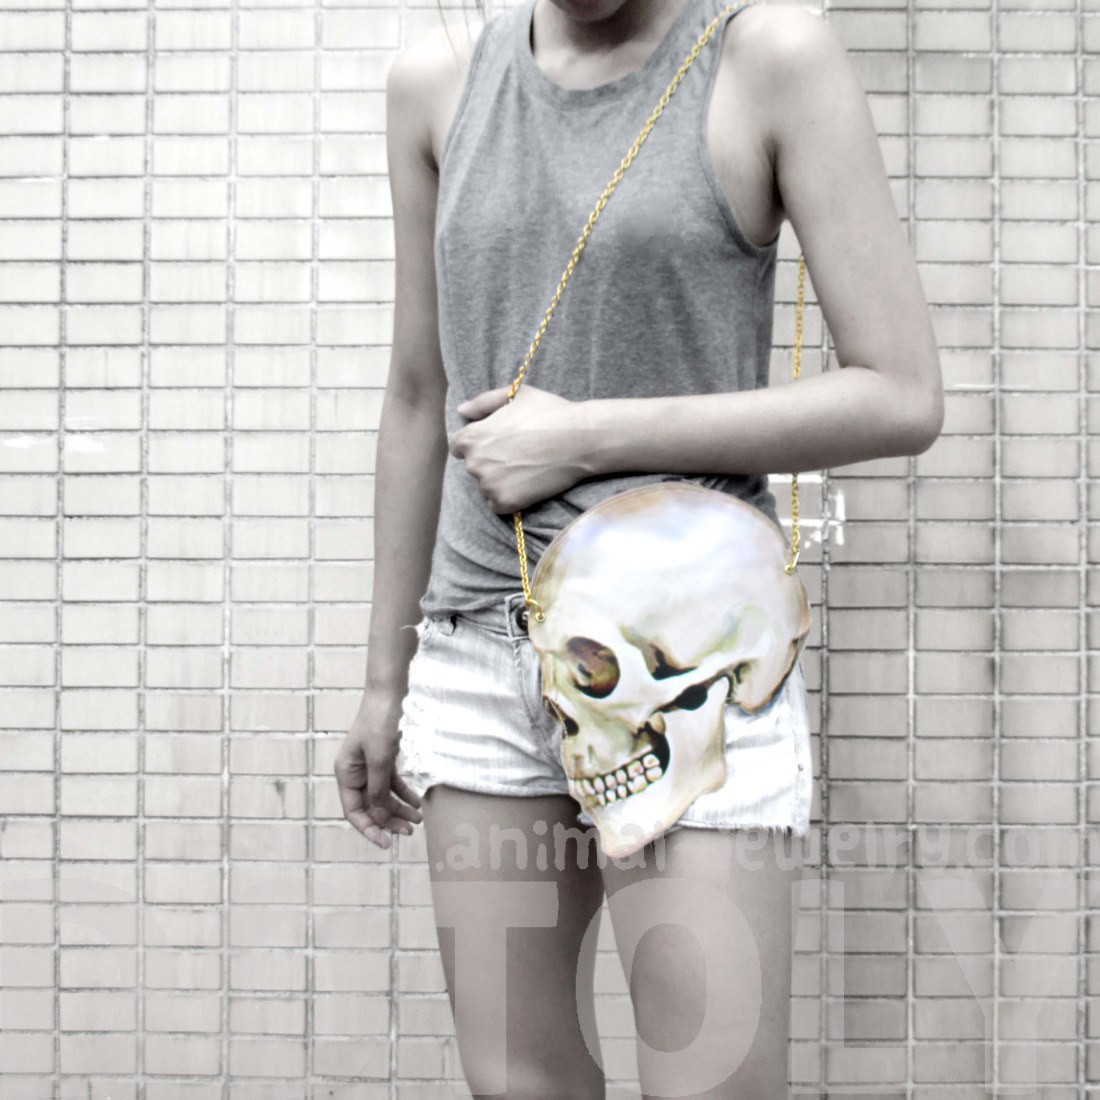 Quirky skeleton skull bones head shaped vinyl cross body shoulder bag  handmade cute small 860d05683329f